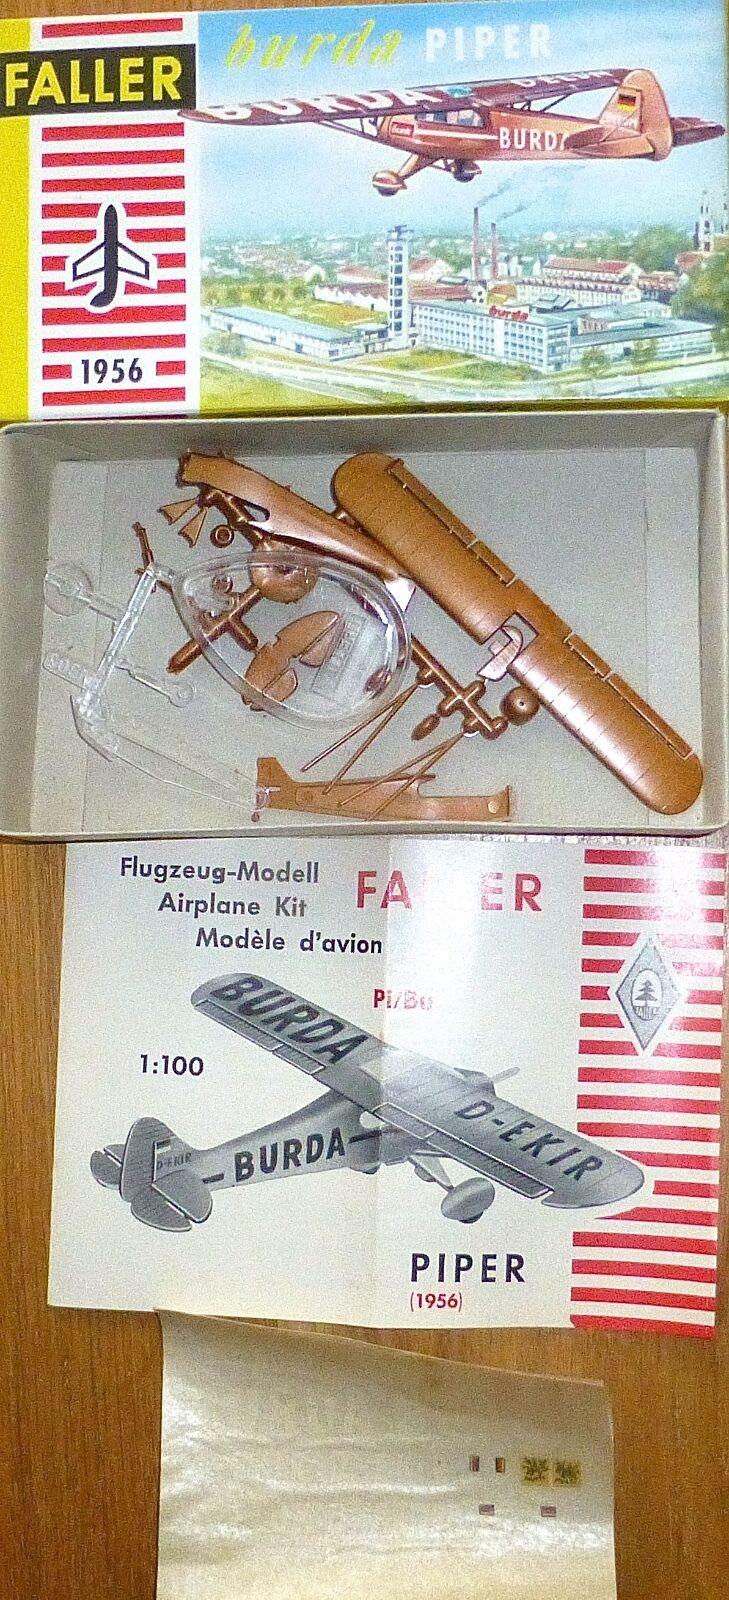 Burda Piper Pi   Bu Faller 1956 Ams 1 100 Kit Construcción sin Construir